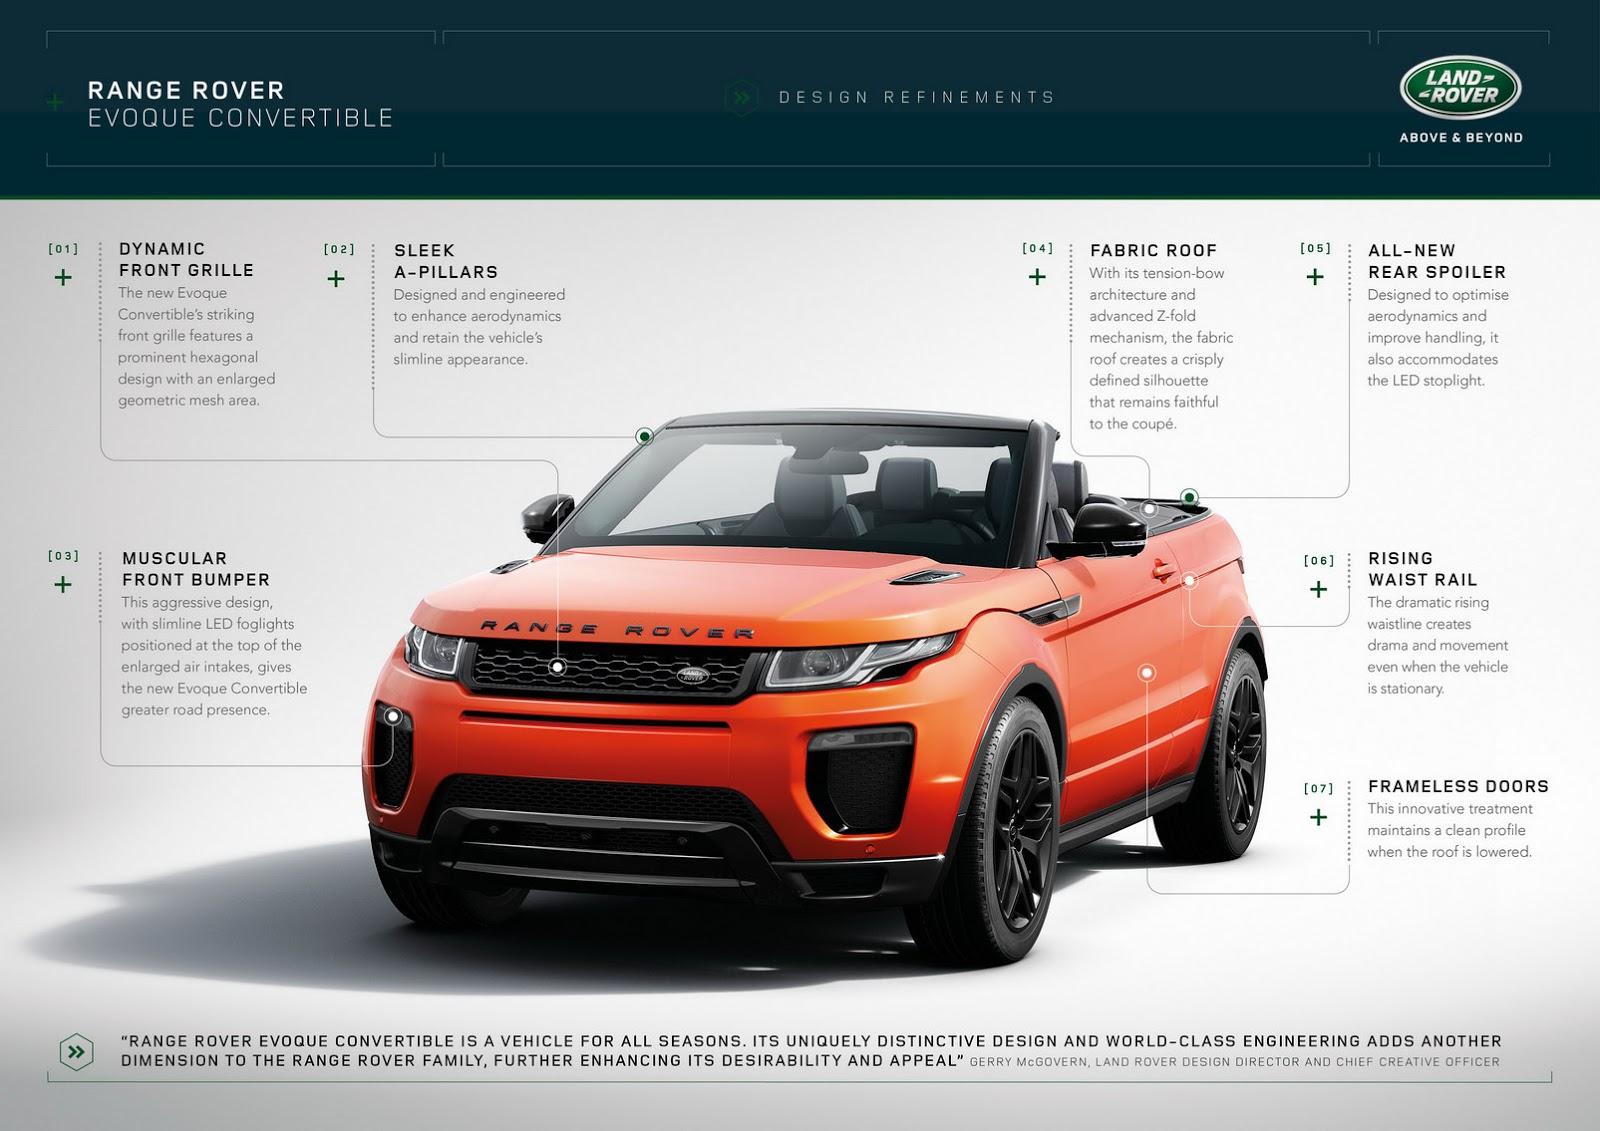 [Image: New-Range-Rover-Evoque-Convertible-1.jpg]